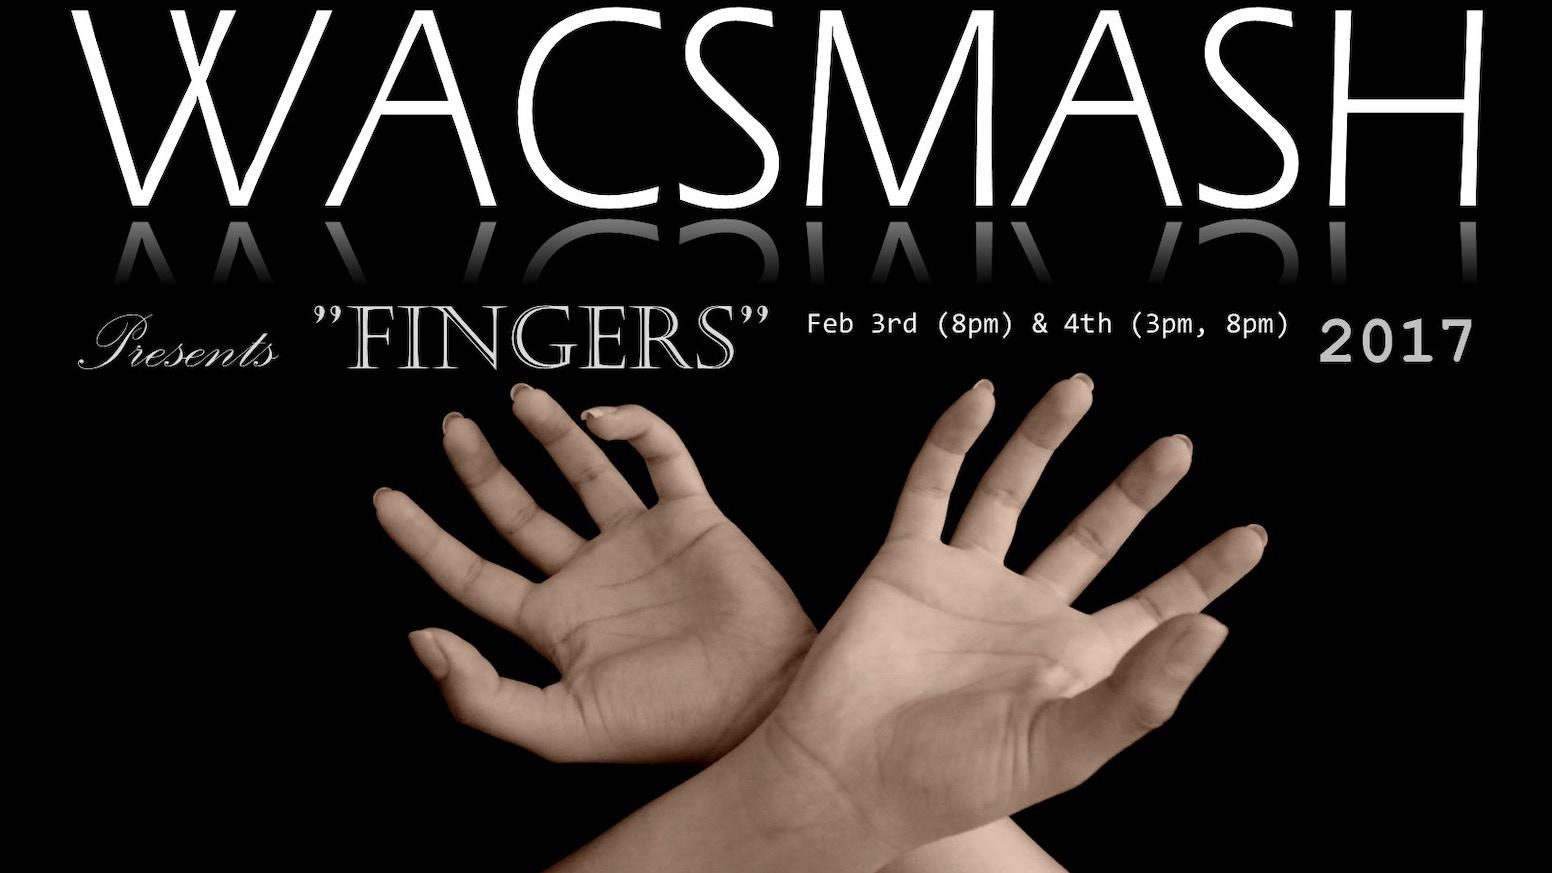 Wacsmash 2017 is an interdisciplinary showcase choreographed and produced by undergraduate students at UCLA.